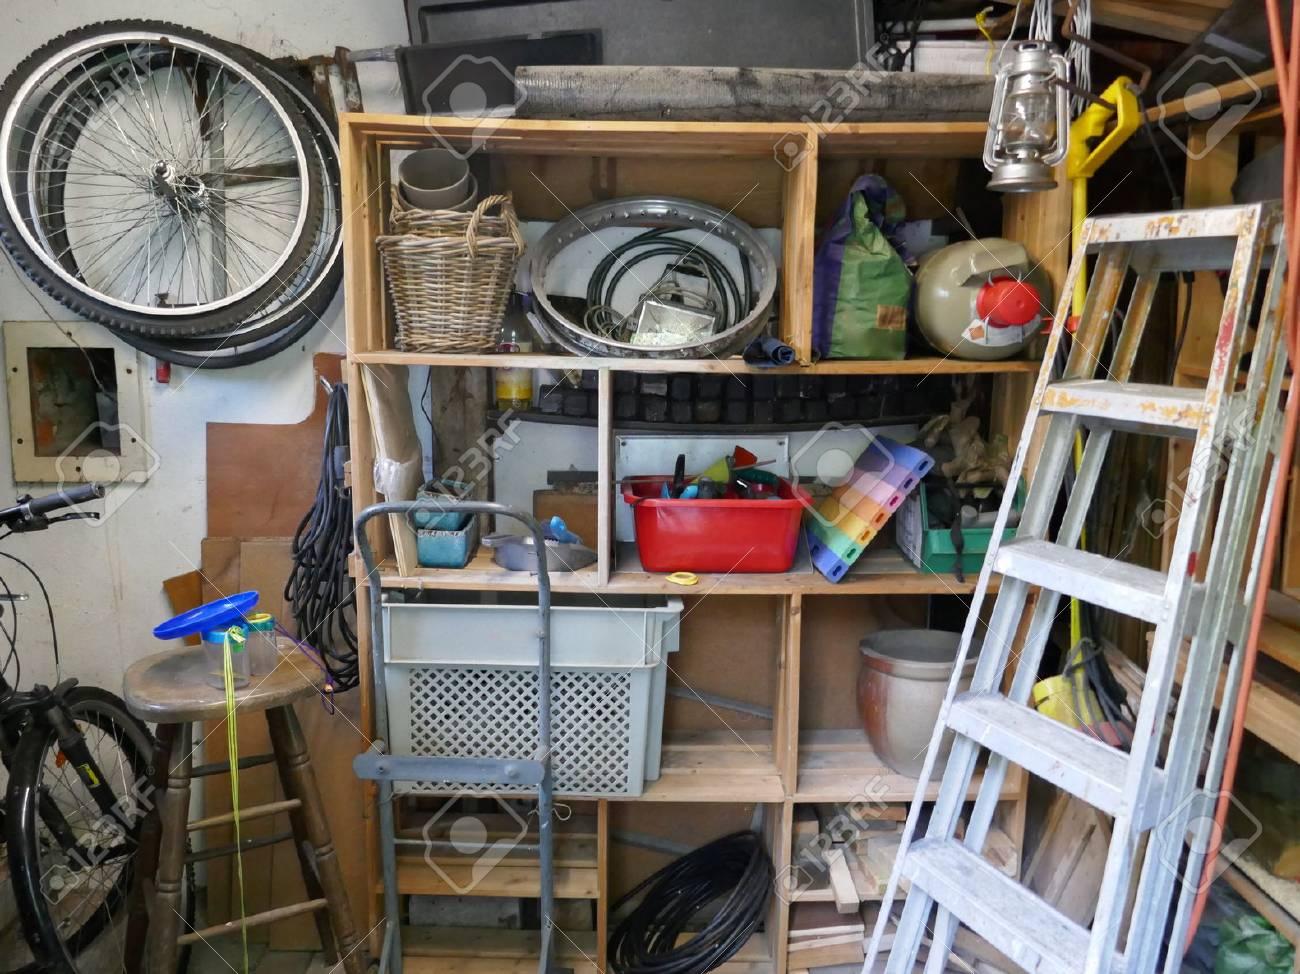 Messy storeroom - 88916355